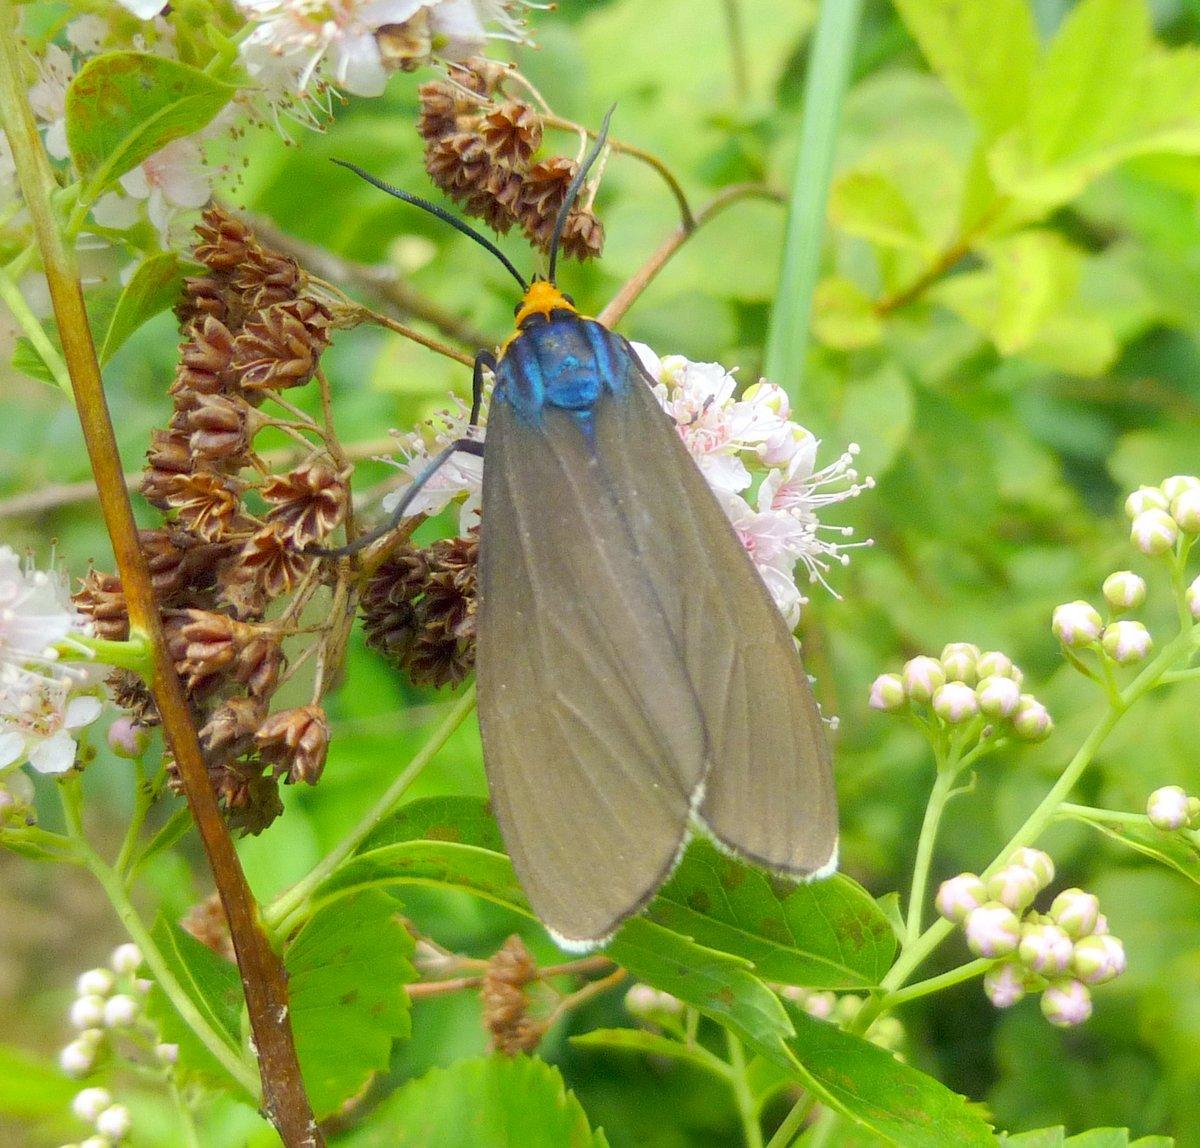 1. Virginia Ctenucha aka Ctenucha virginica moth